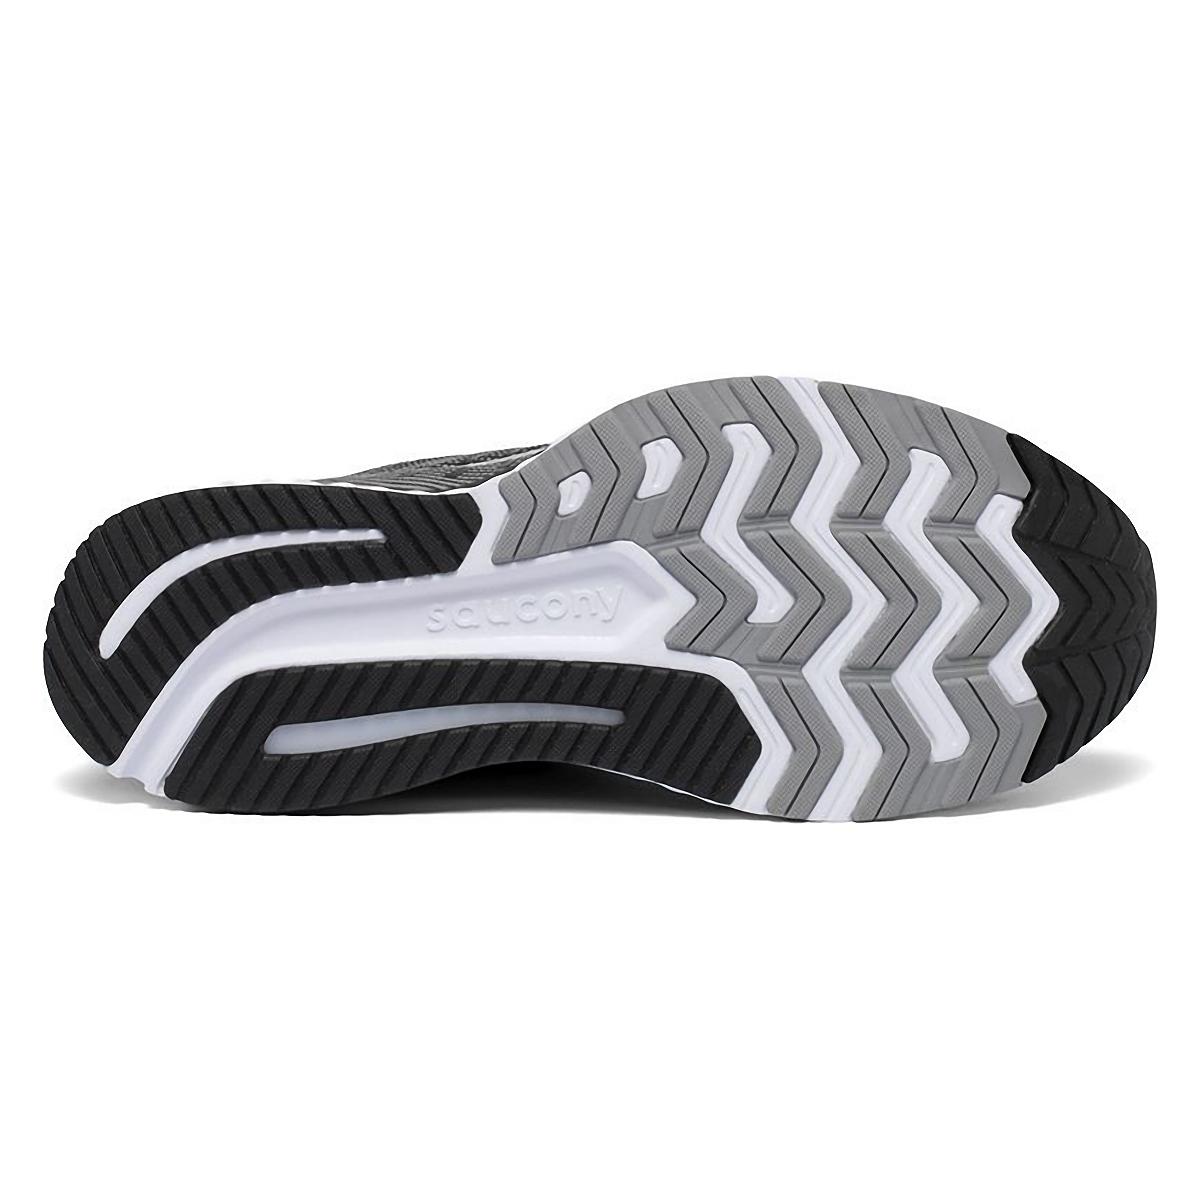 Men's Saucony Guide 13 Walking Shoe - Color: Black/White - Size: 8 - Width: Regular, Black/White, large, image 4